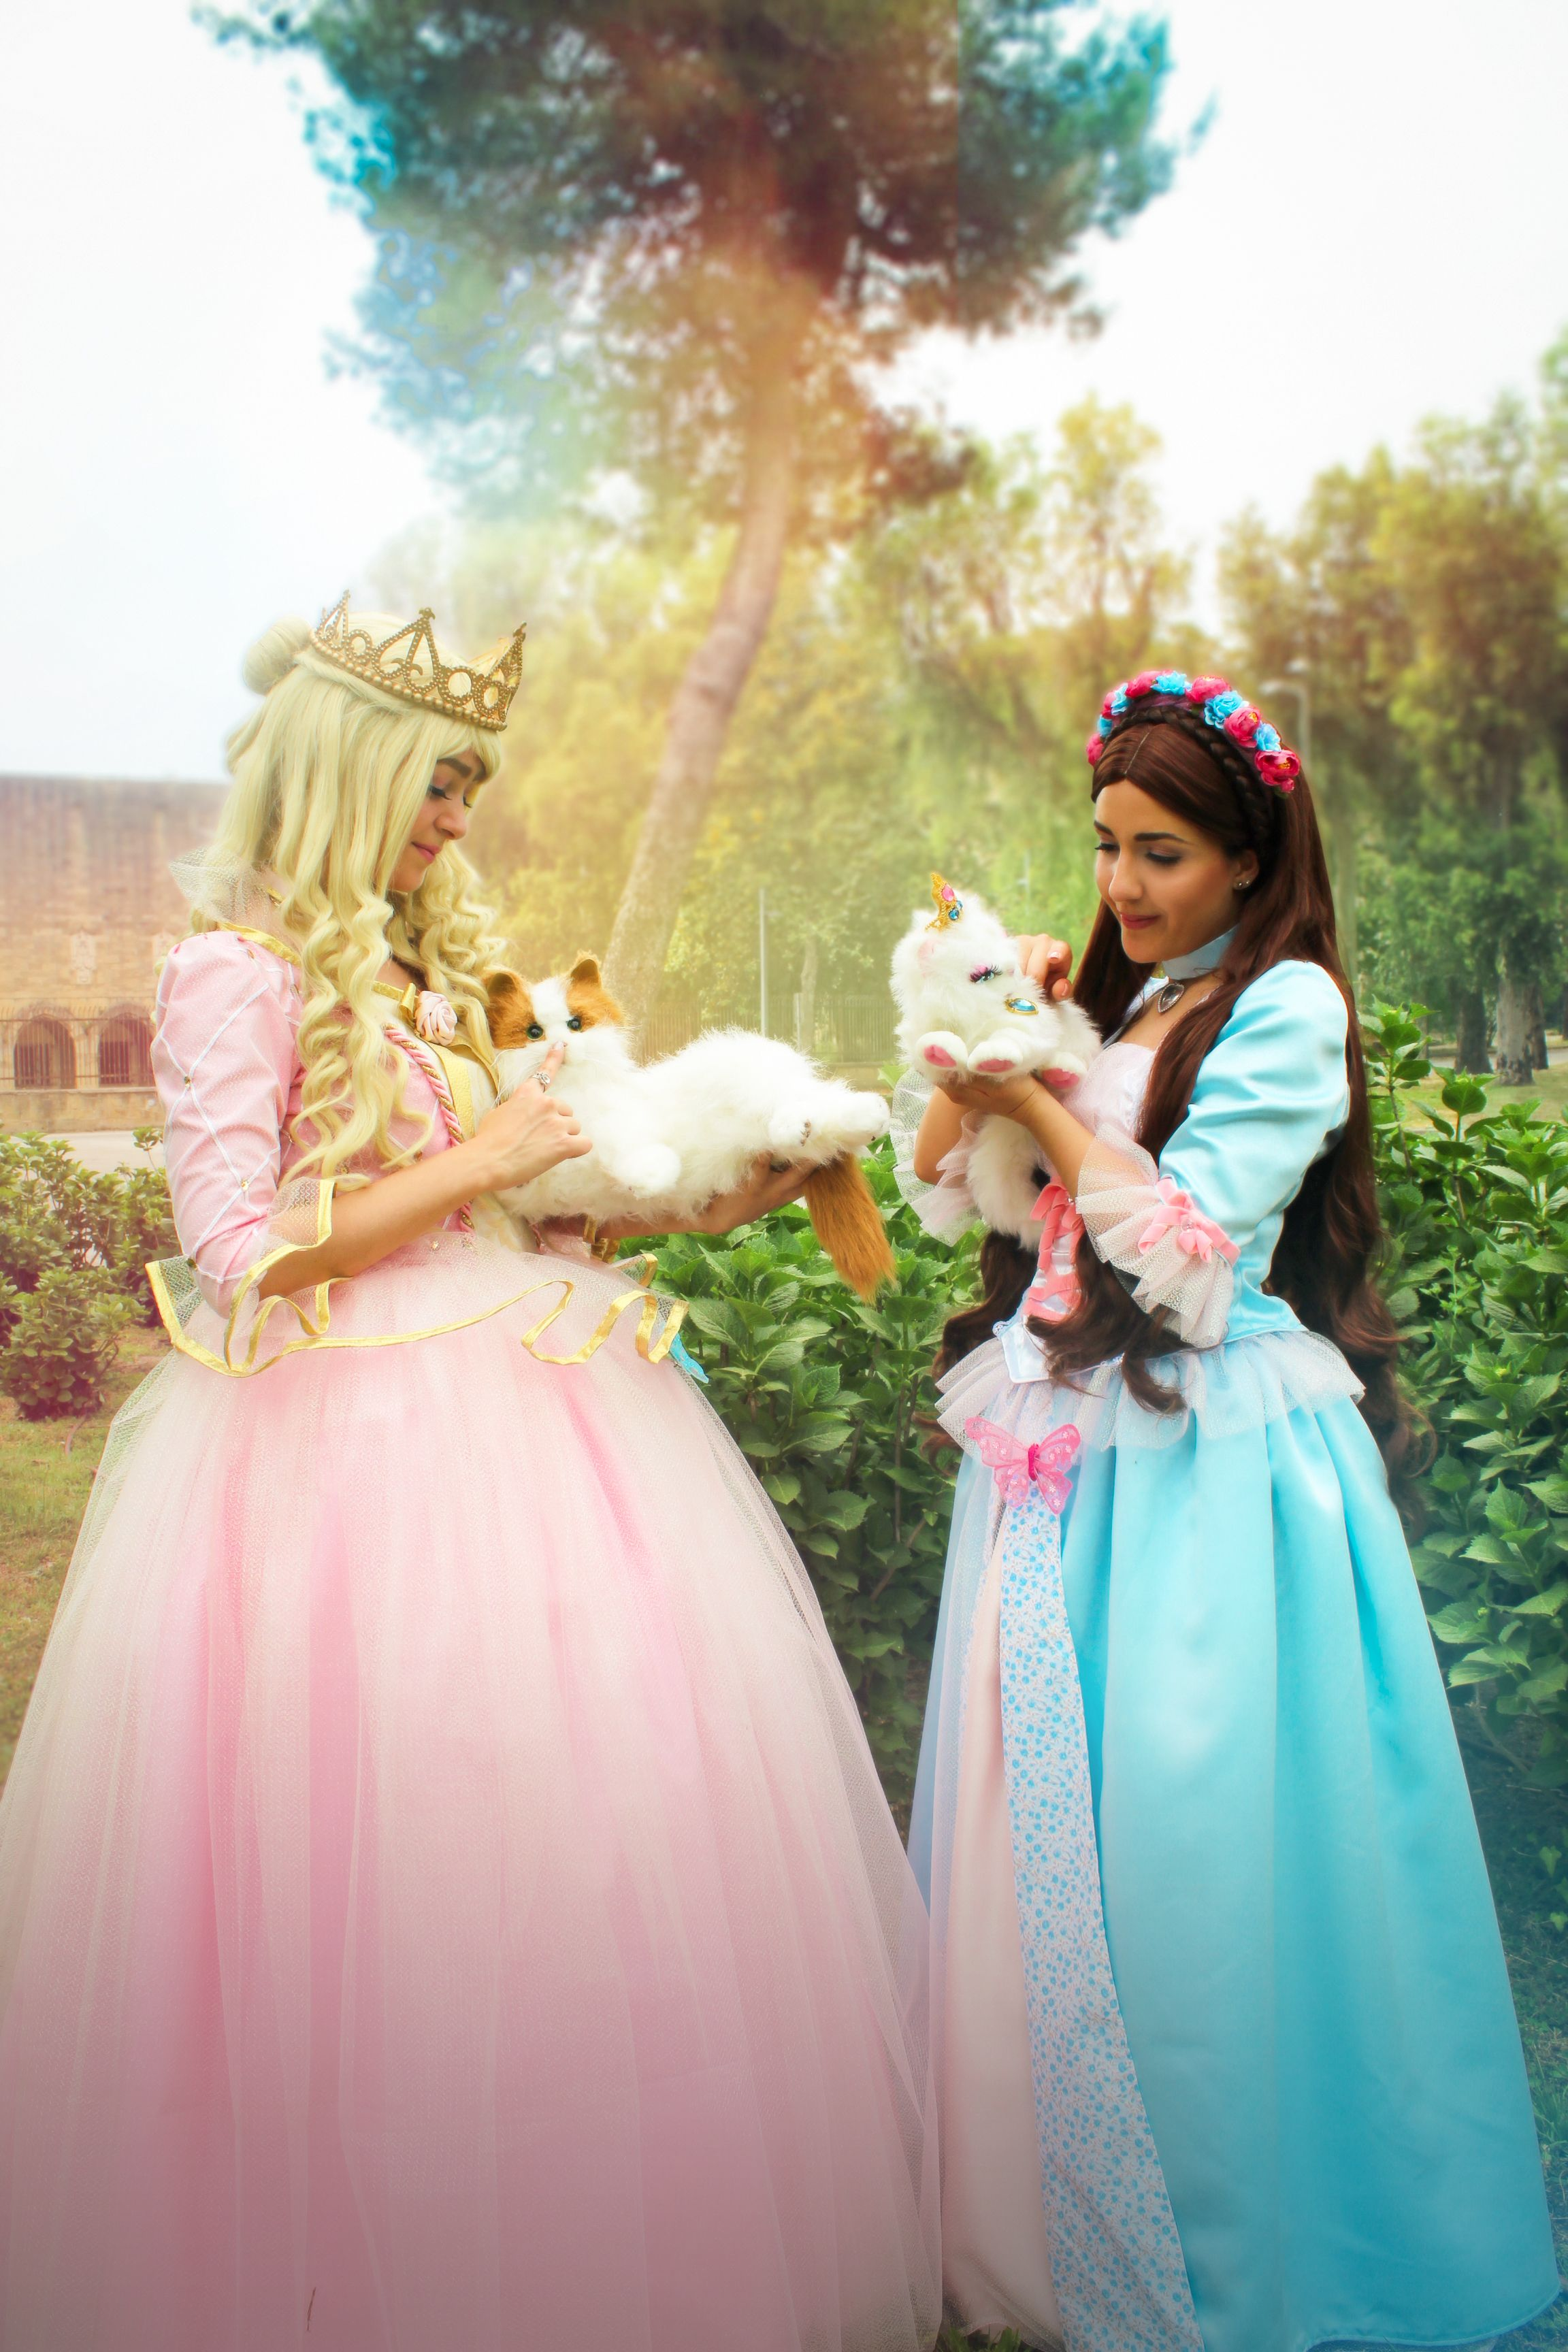 Erika And Anneliese Cosplayers Aishiteru Cosplay And Aurora